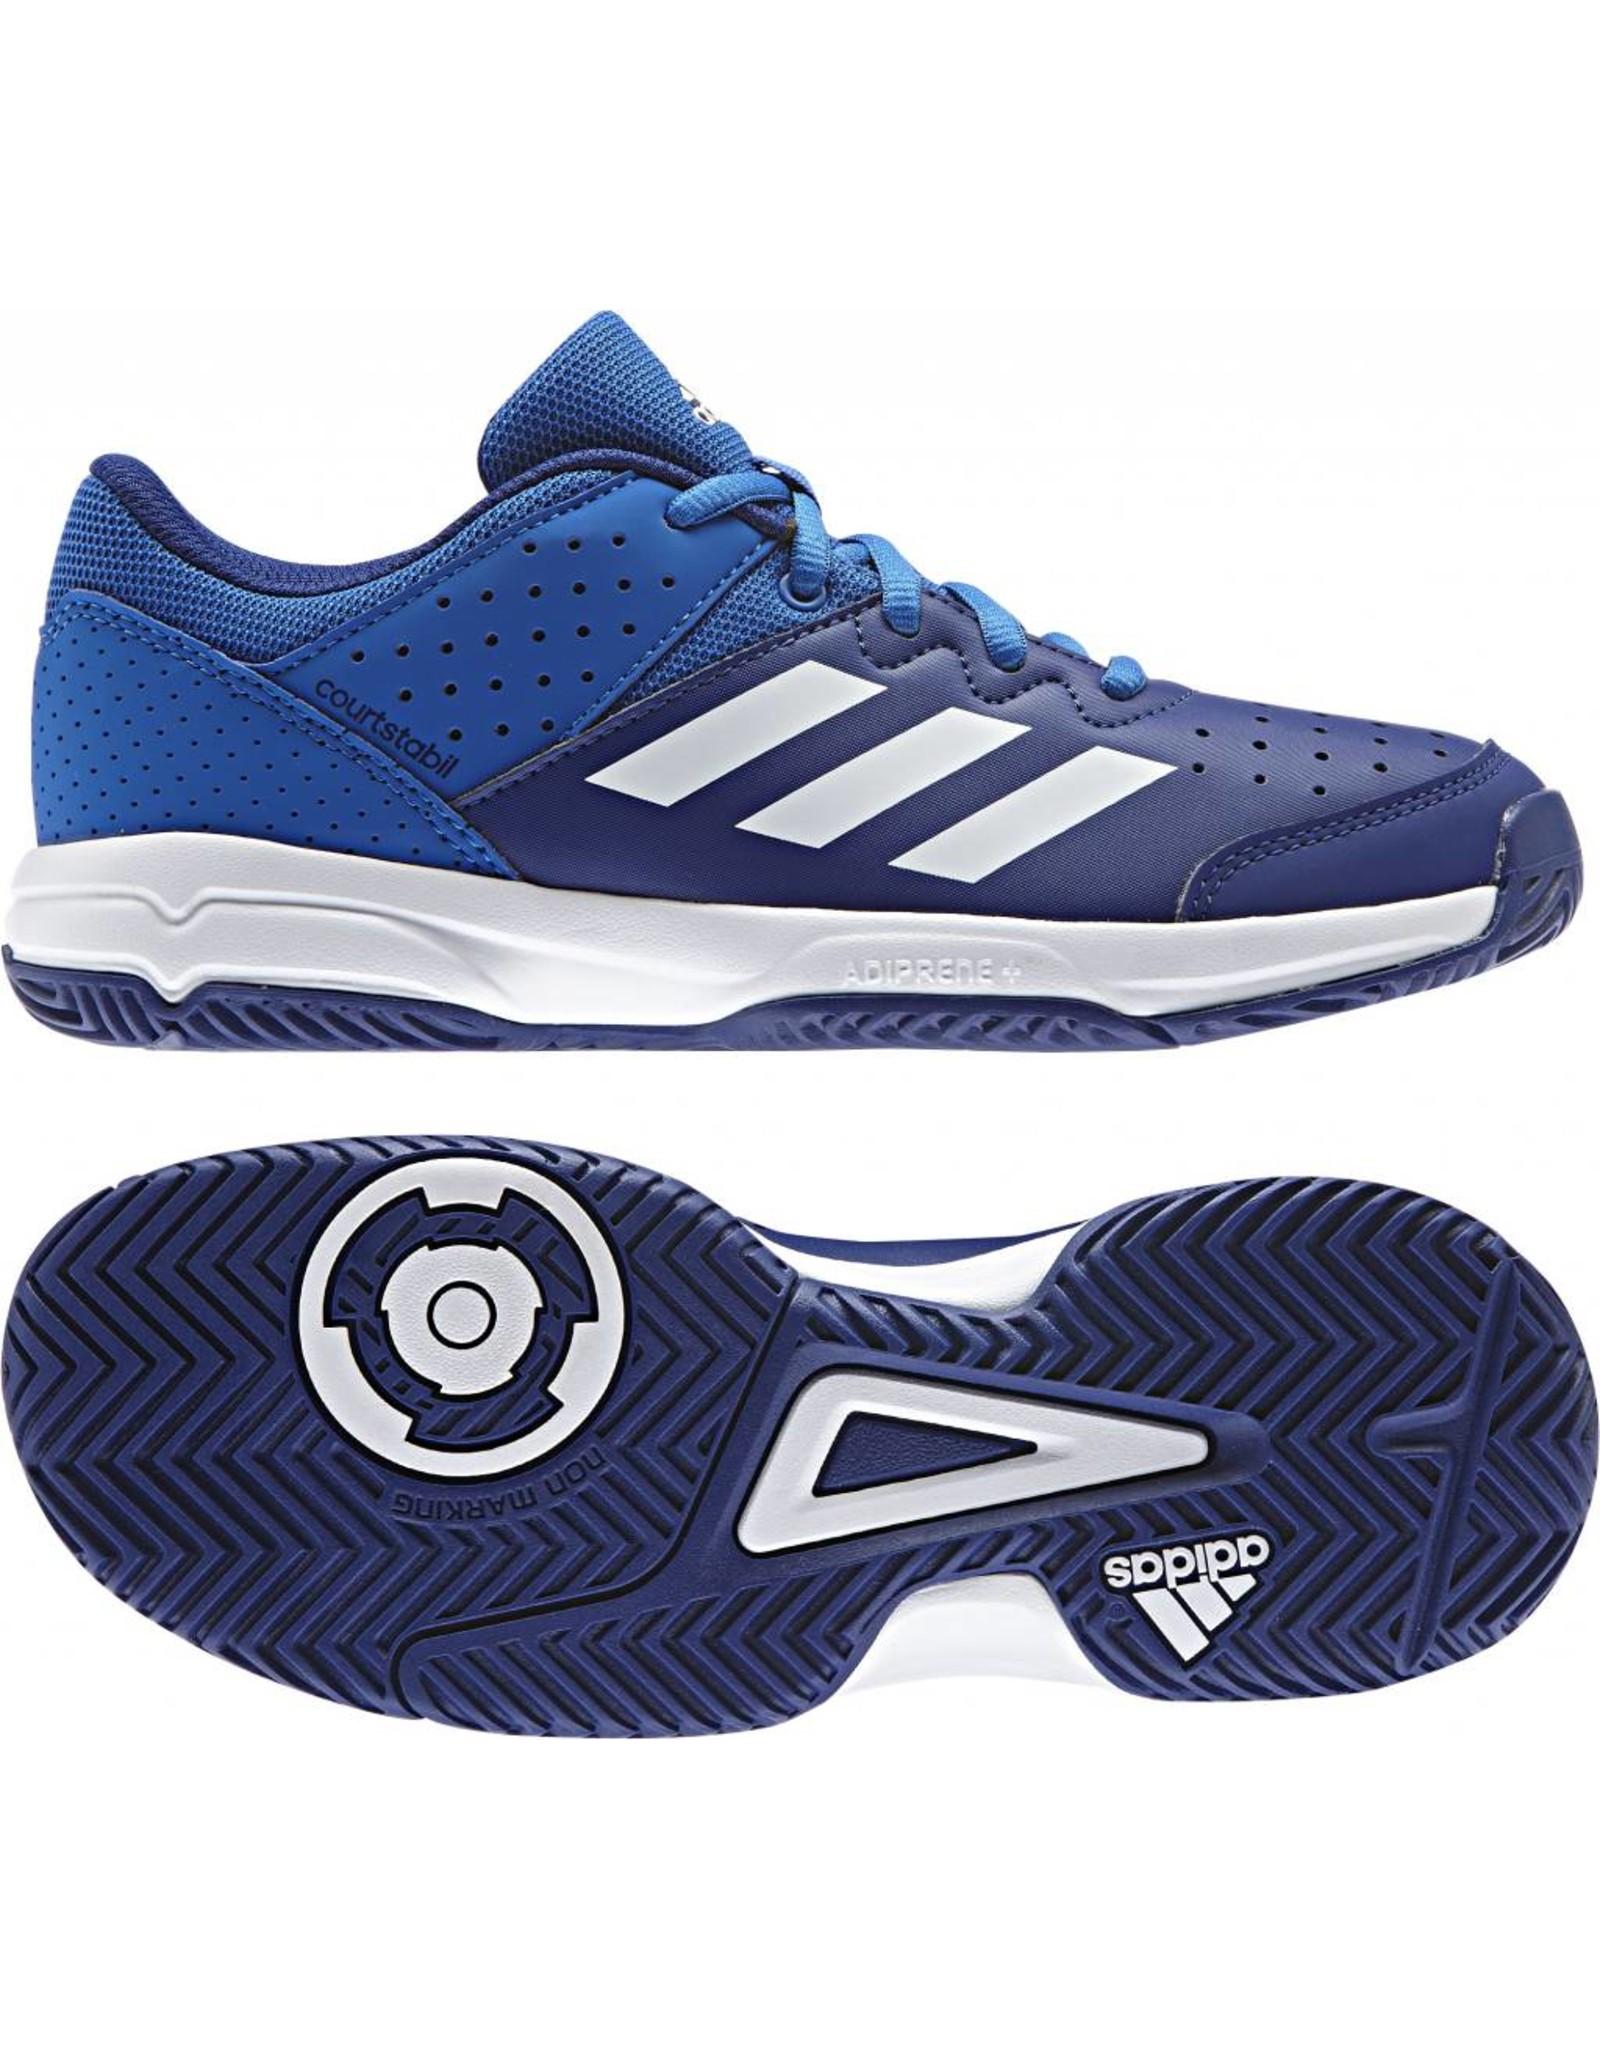 ADIDAS adidas Court Stabil Junior blue schoen 17-18